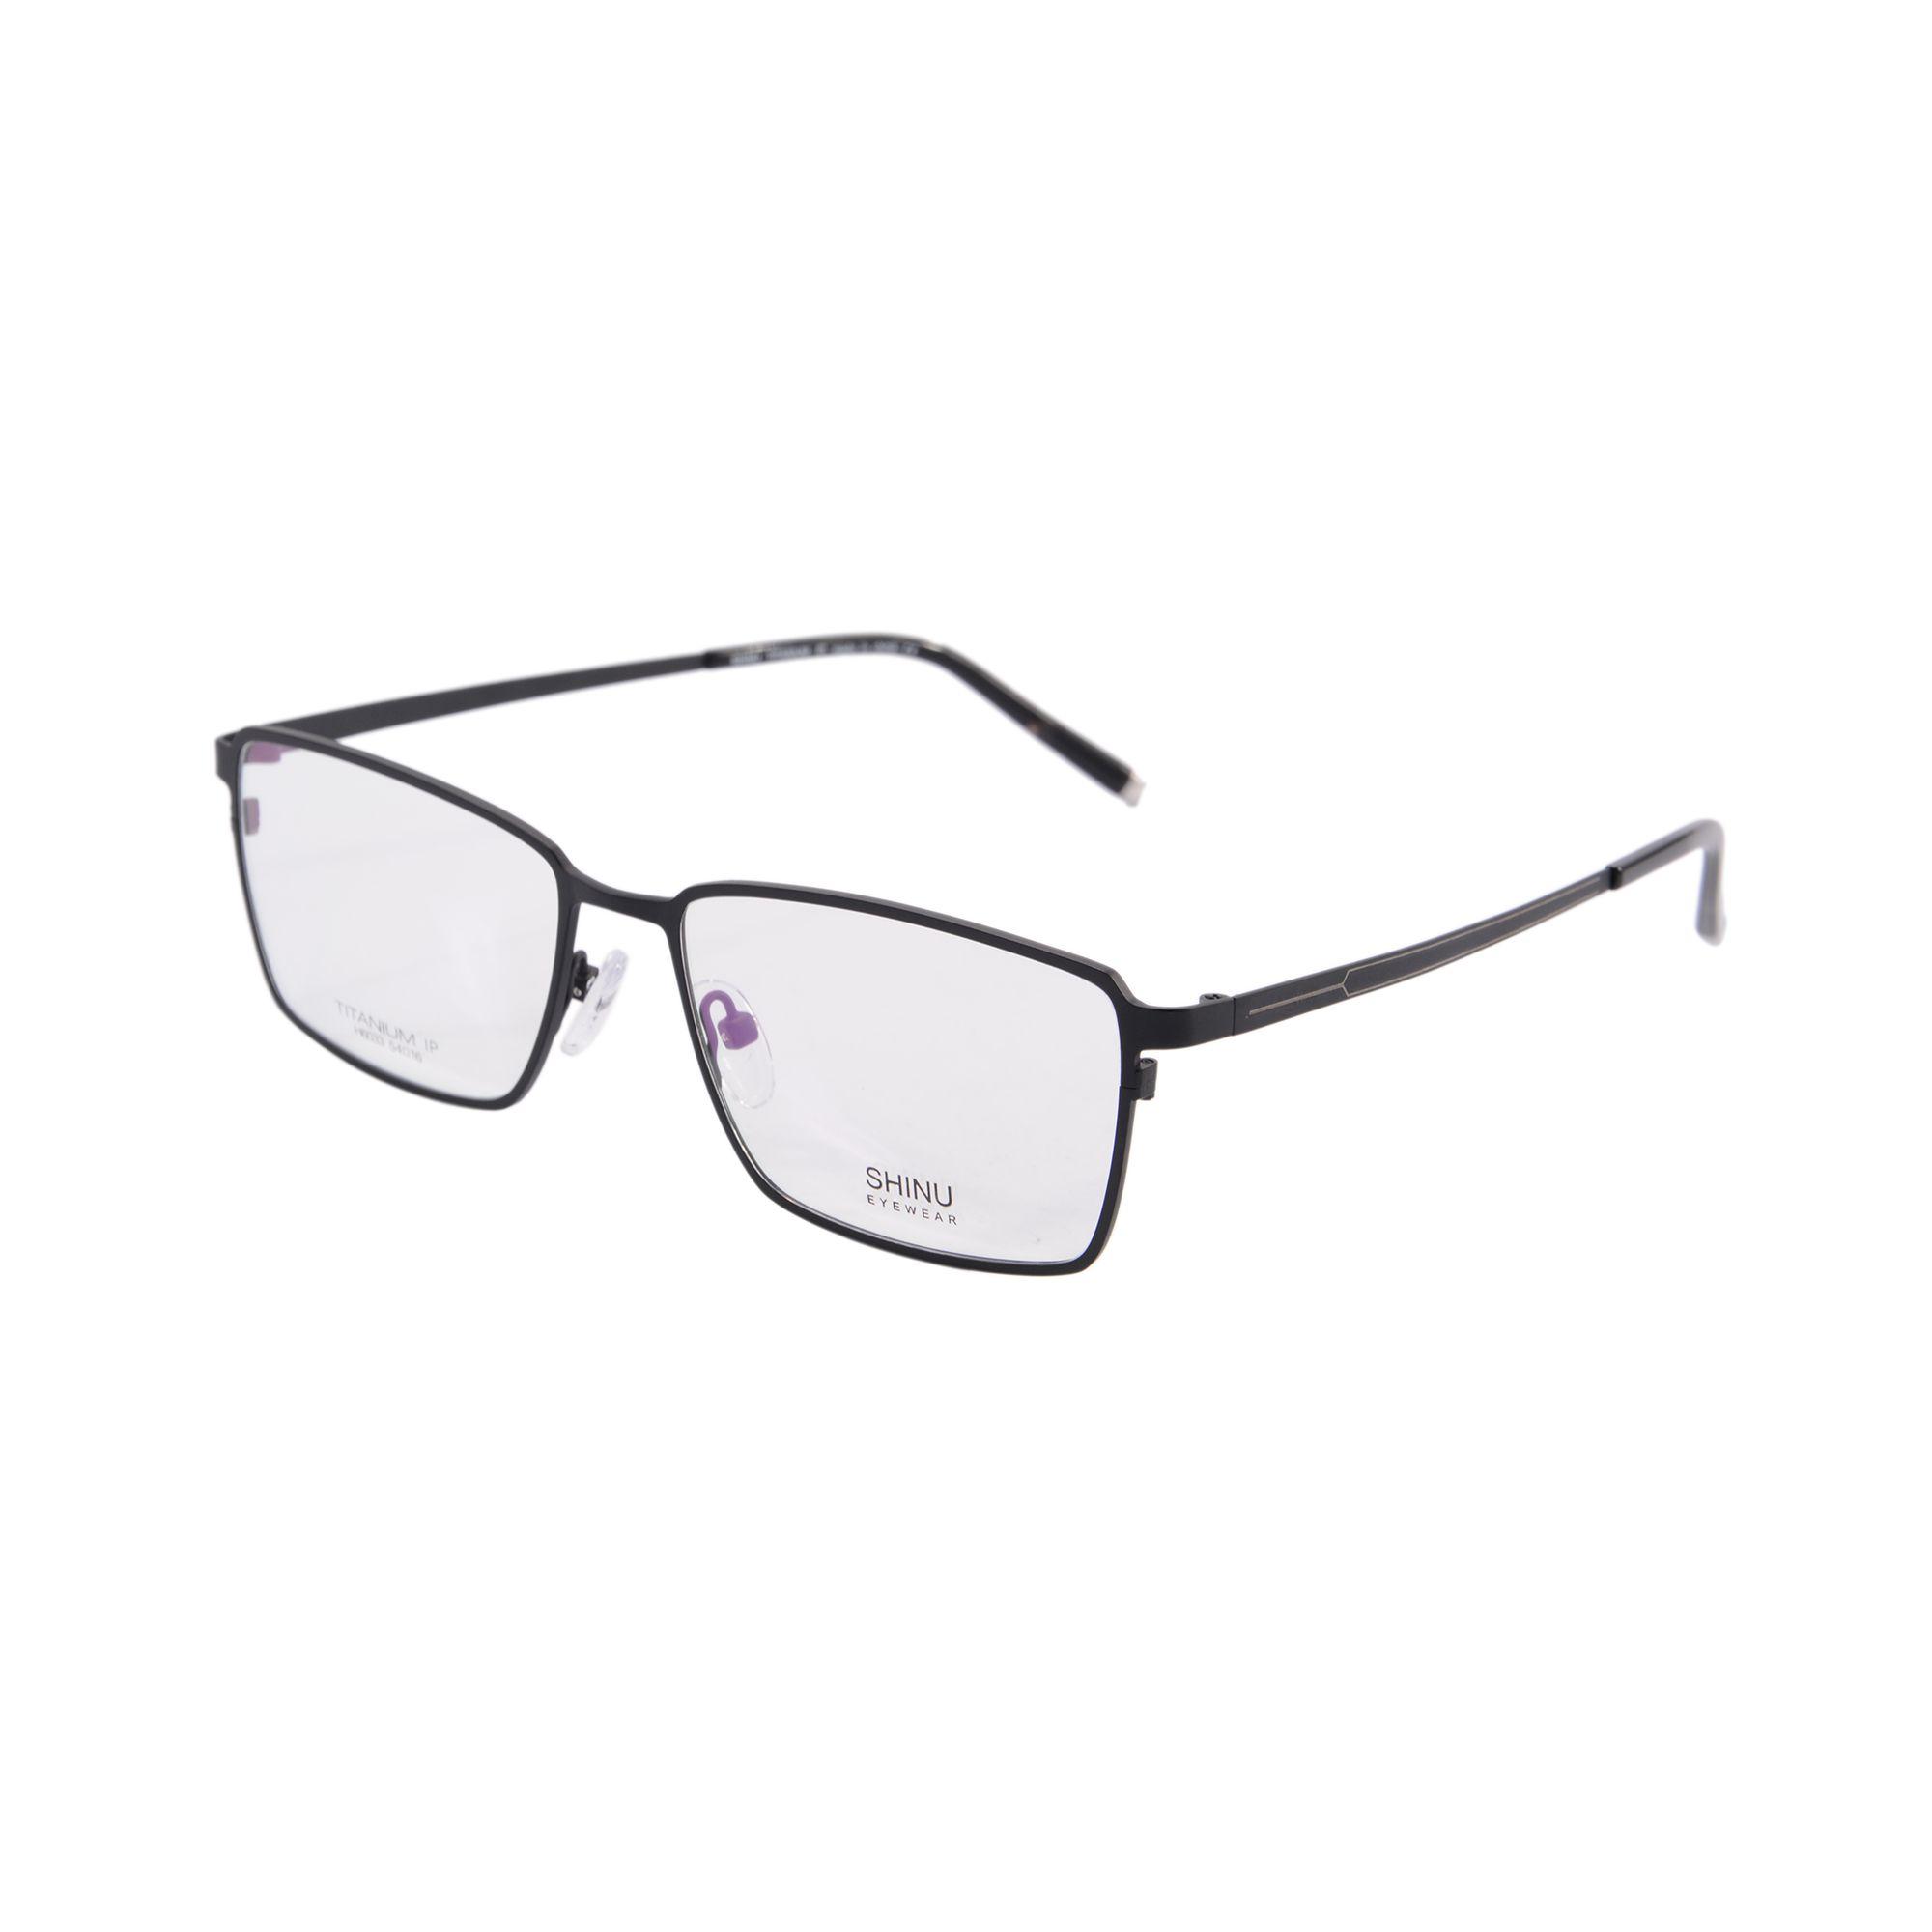 5400721b2a SHINU Titanium Glasses Frame Optical Prescription Eyeglasse Eyewear ...